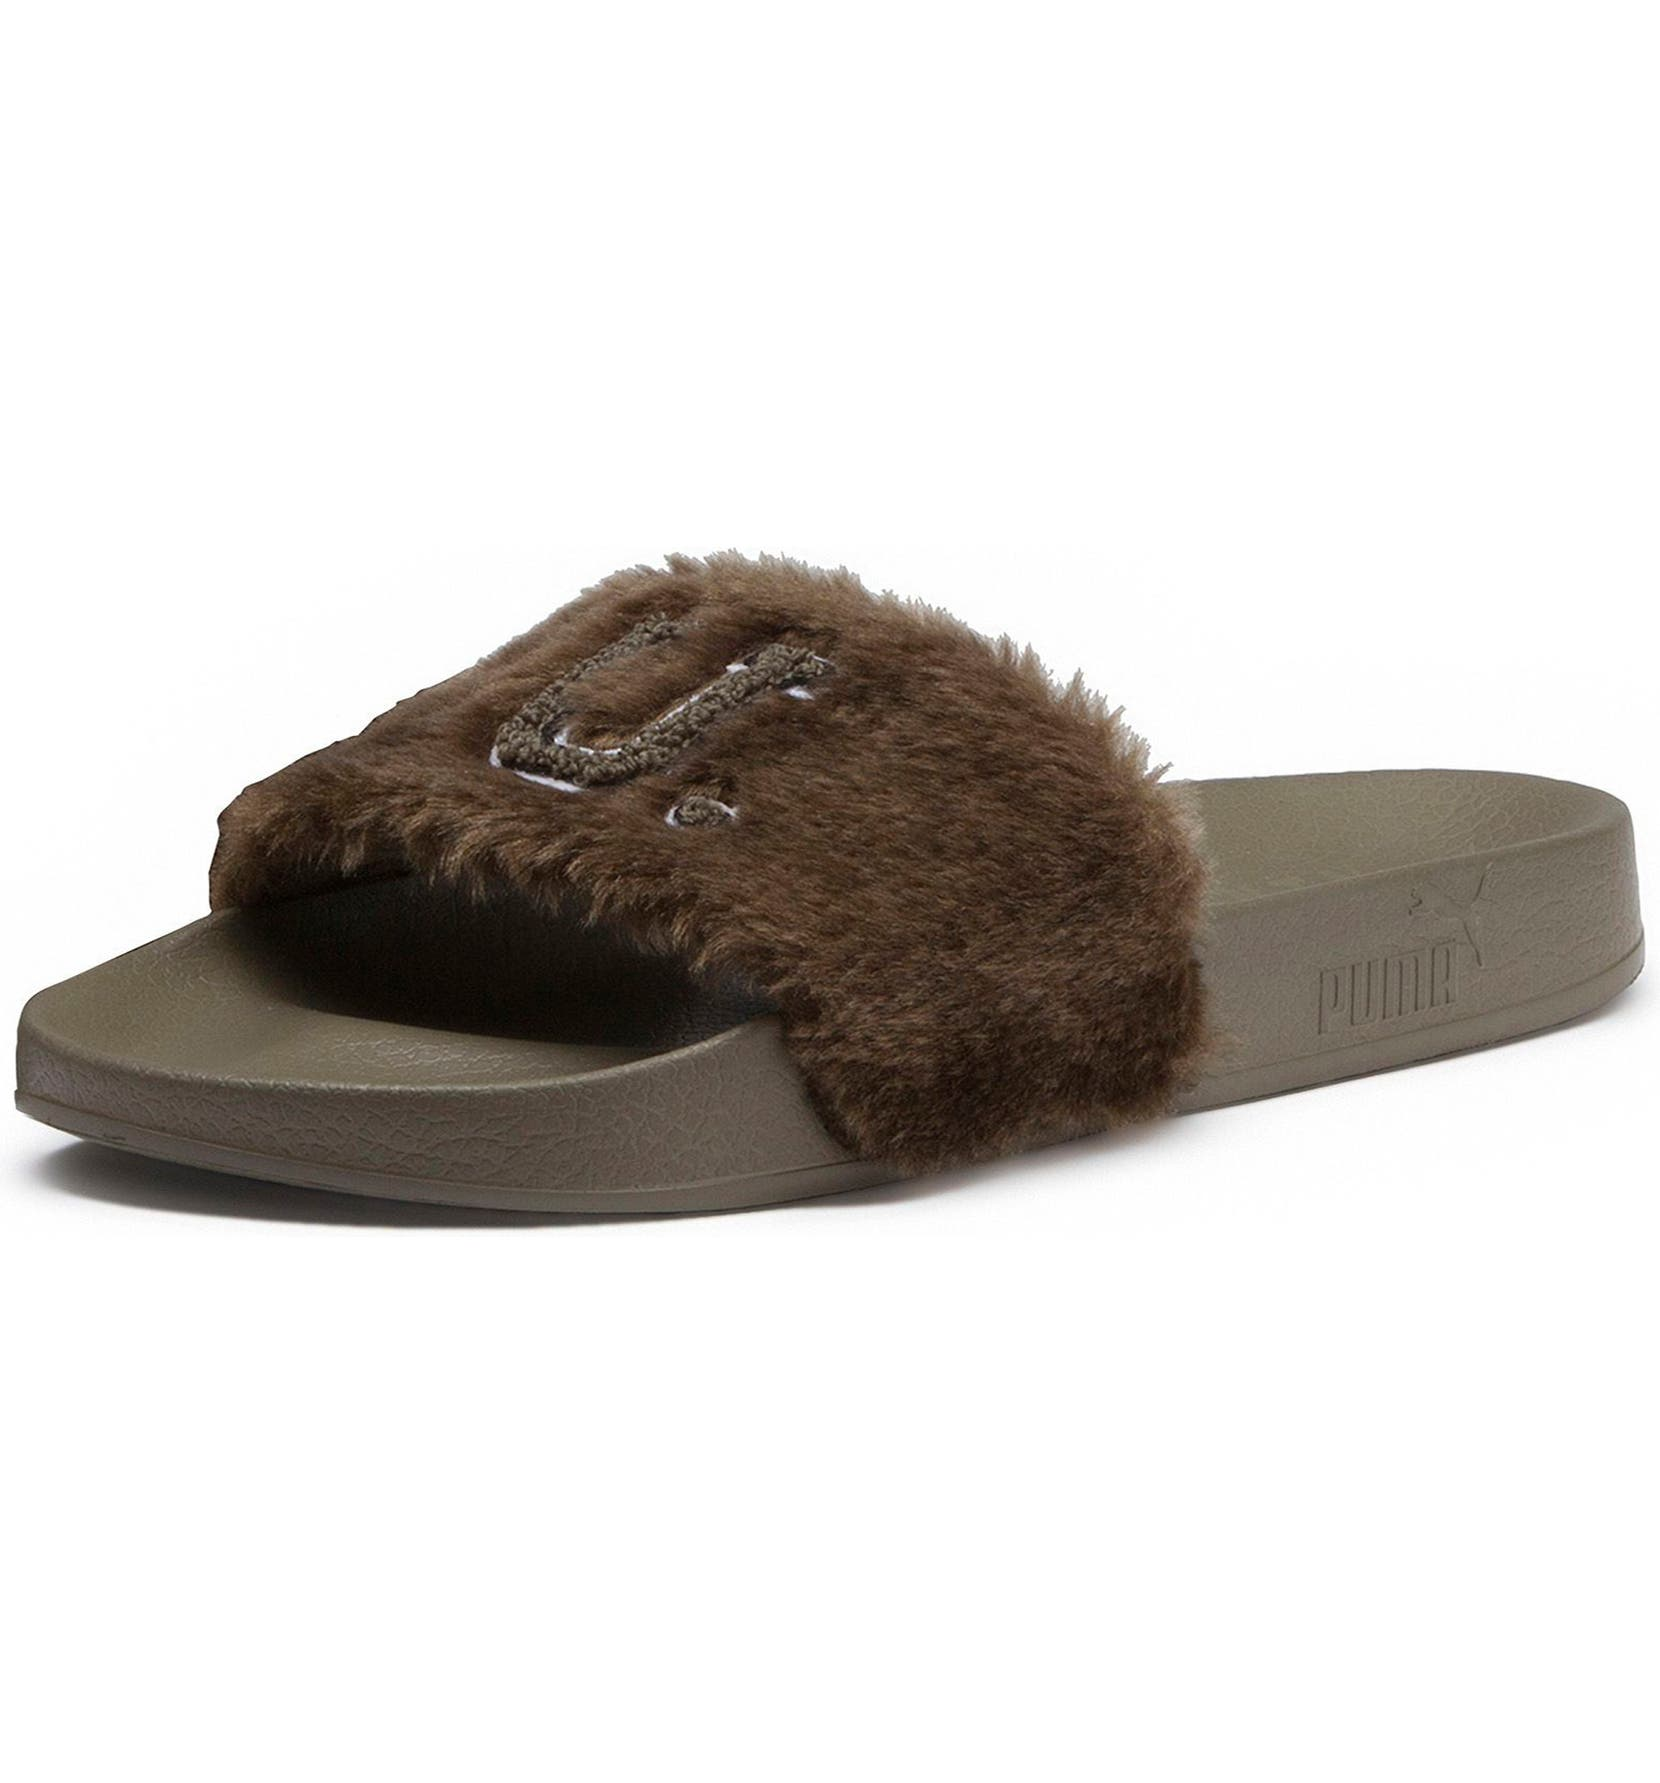 dae294a6c941 FENTY PUMA by Rihanna Lead Cat Slide Sandals (Women)